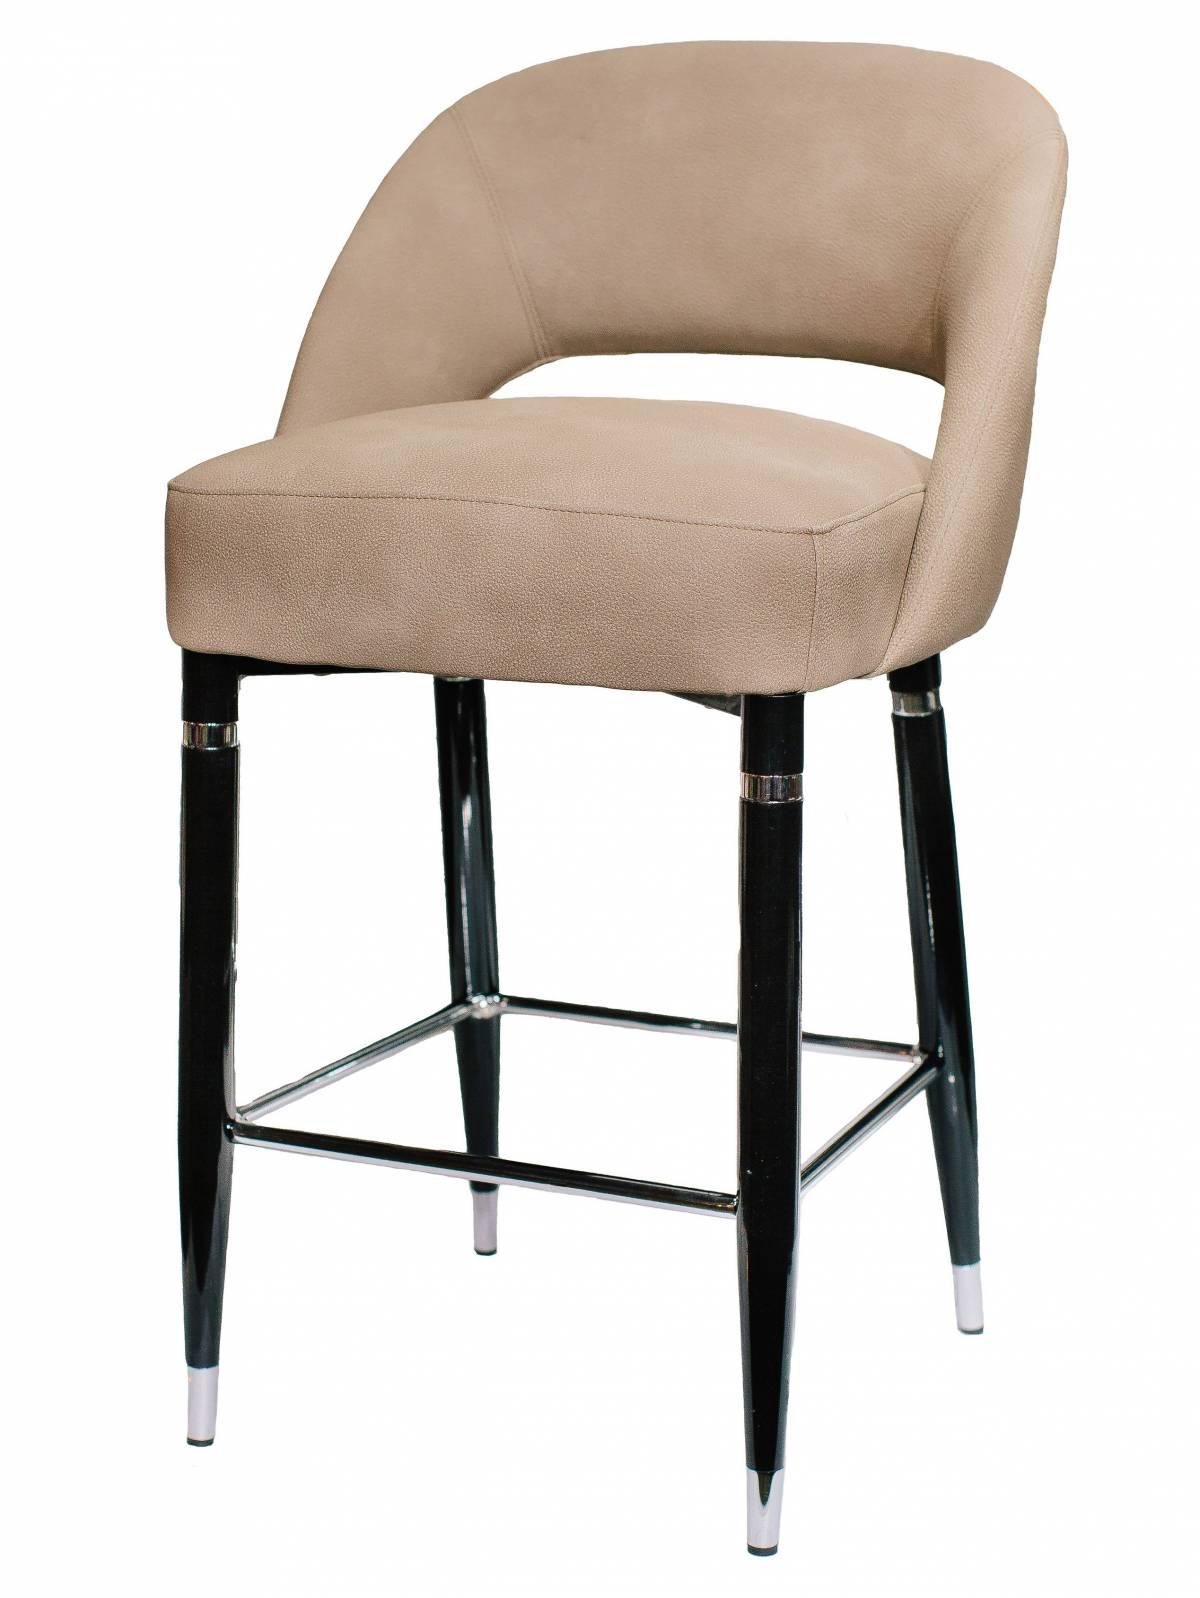 Металлический стул Jazz в Raroom